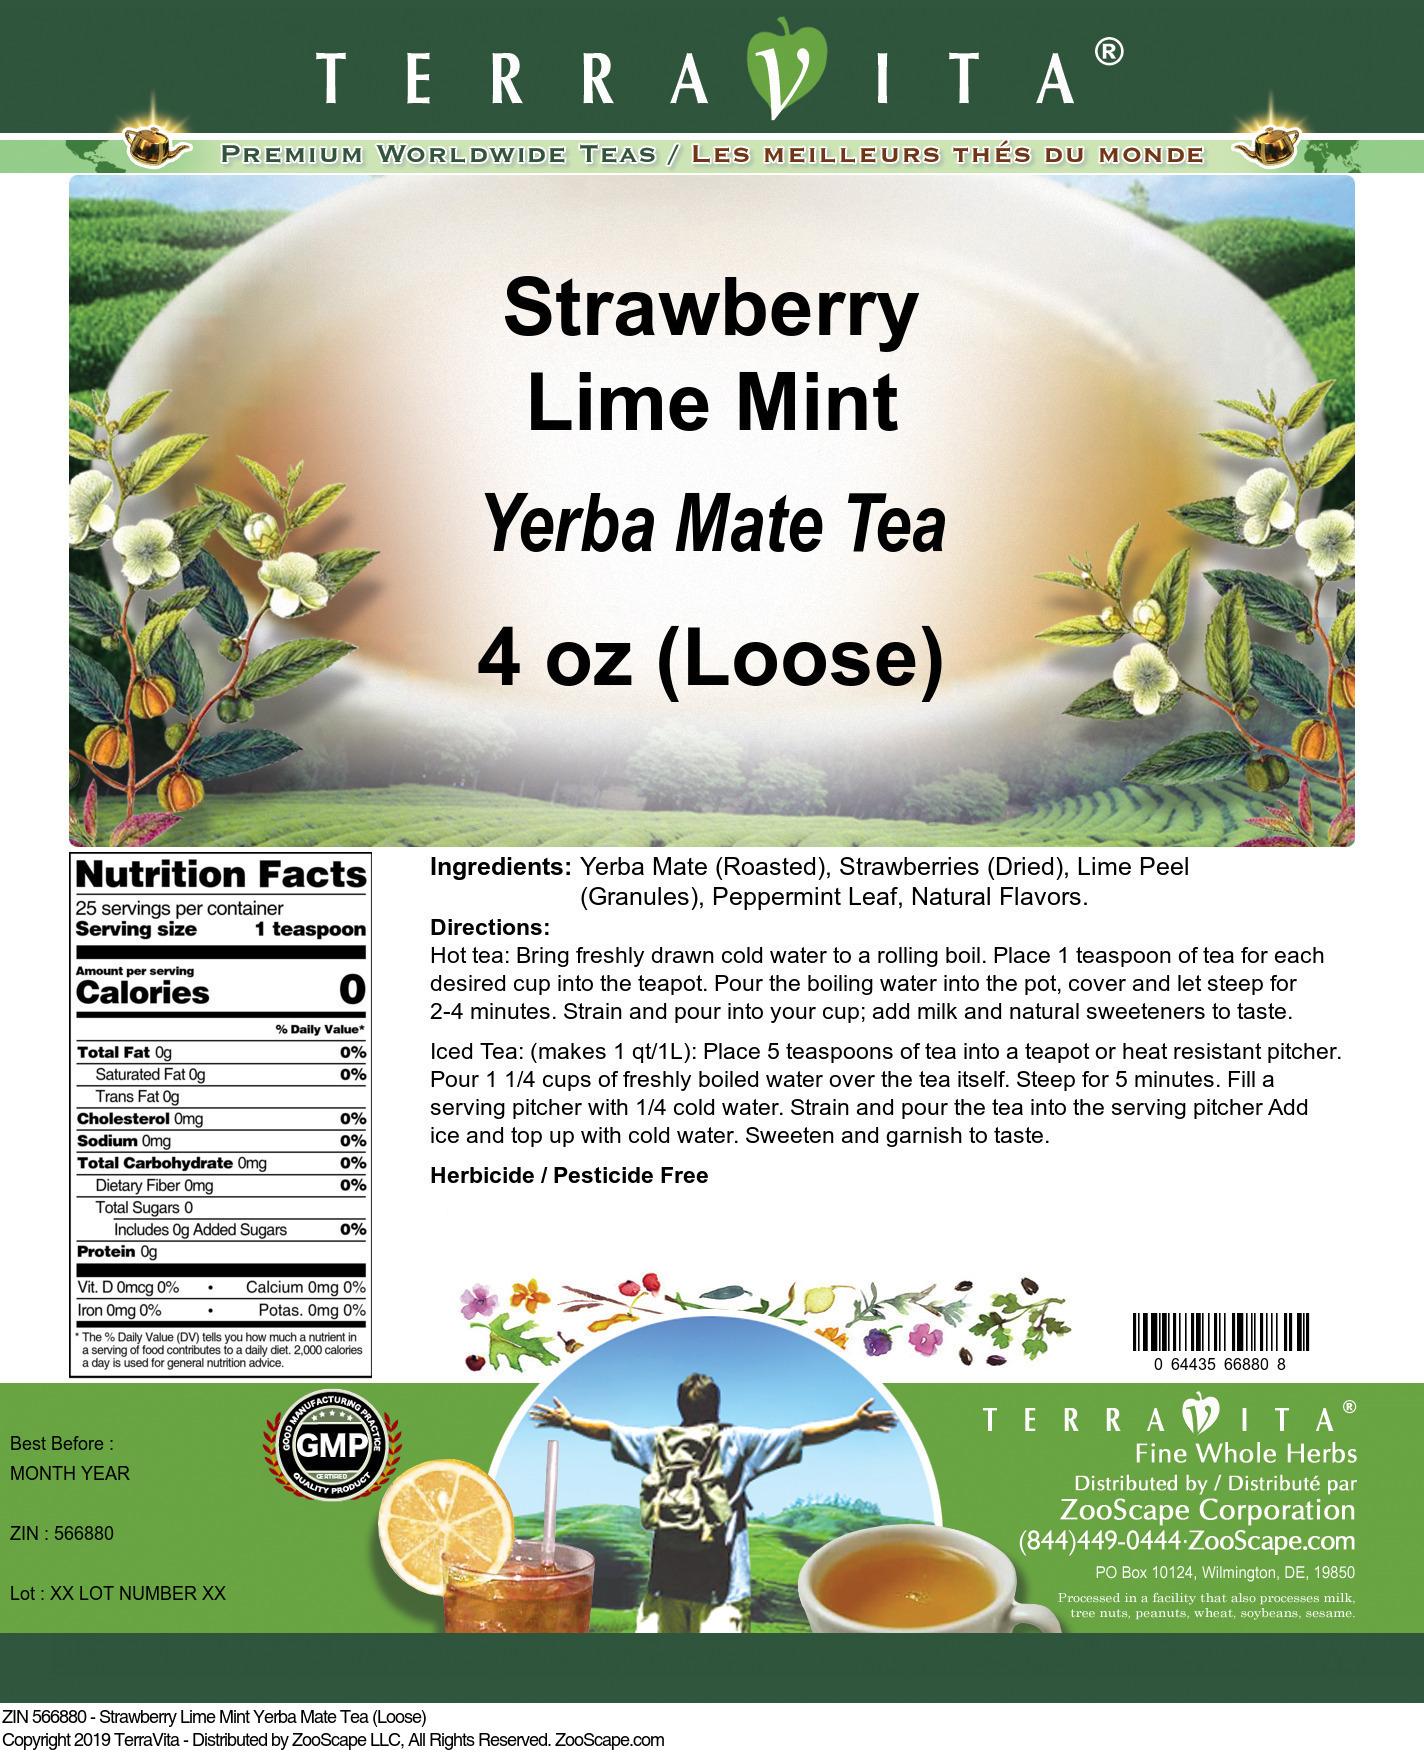 Strawberry Lime Mint Yerba Mate Tea (Loose)